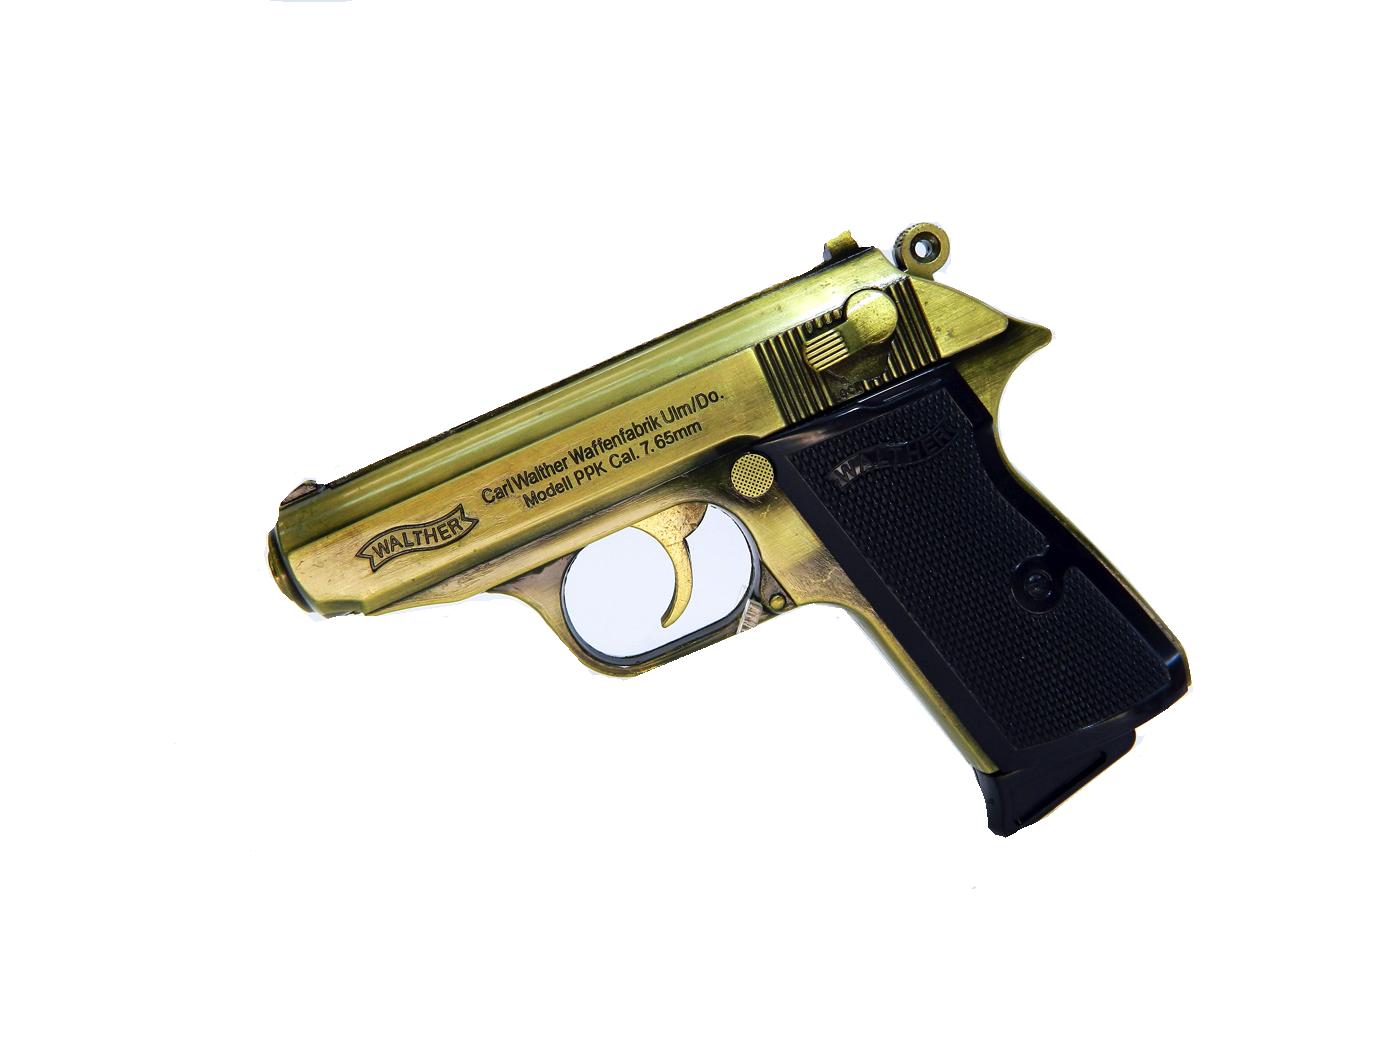 Зажигалка в виде пистолета Walther PPK/S